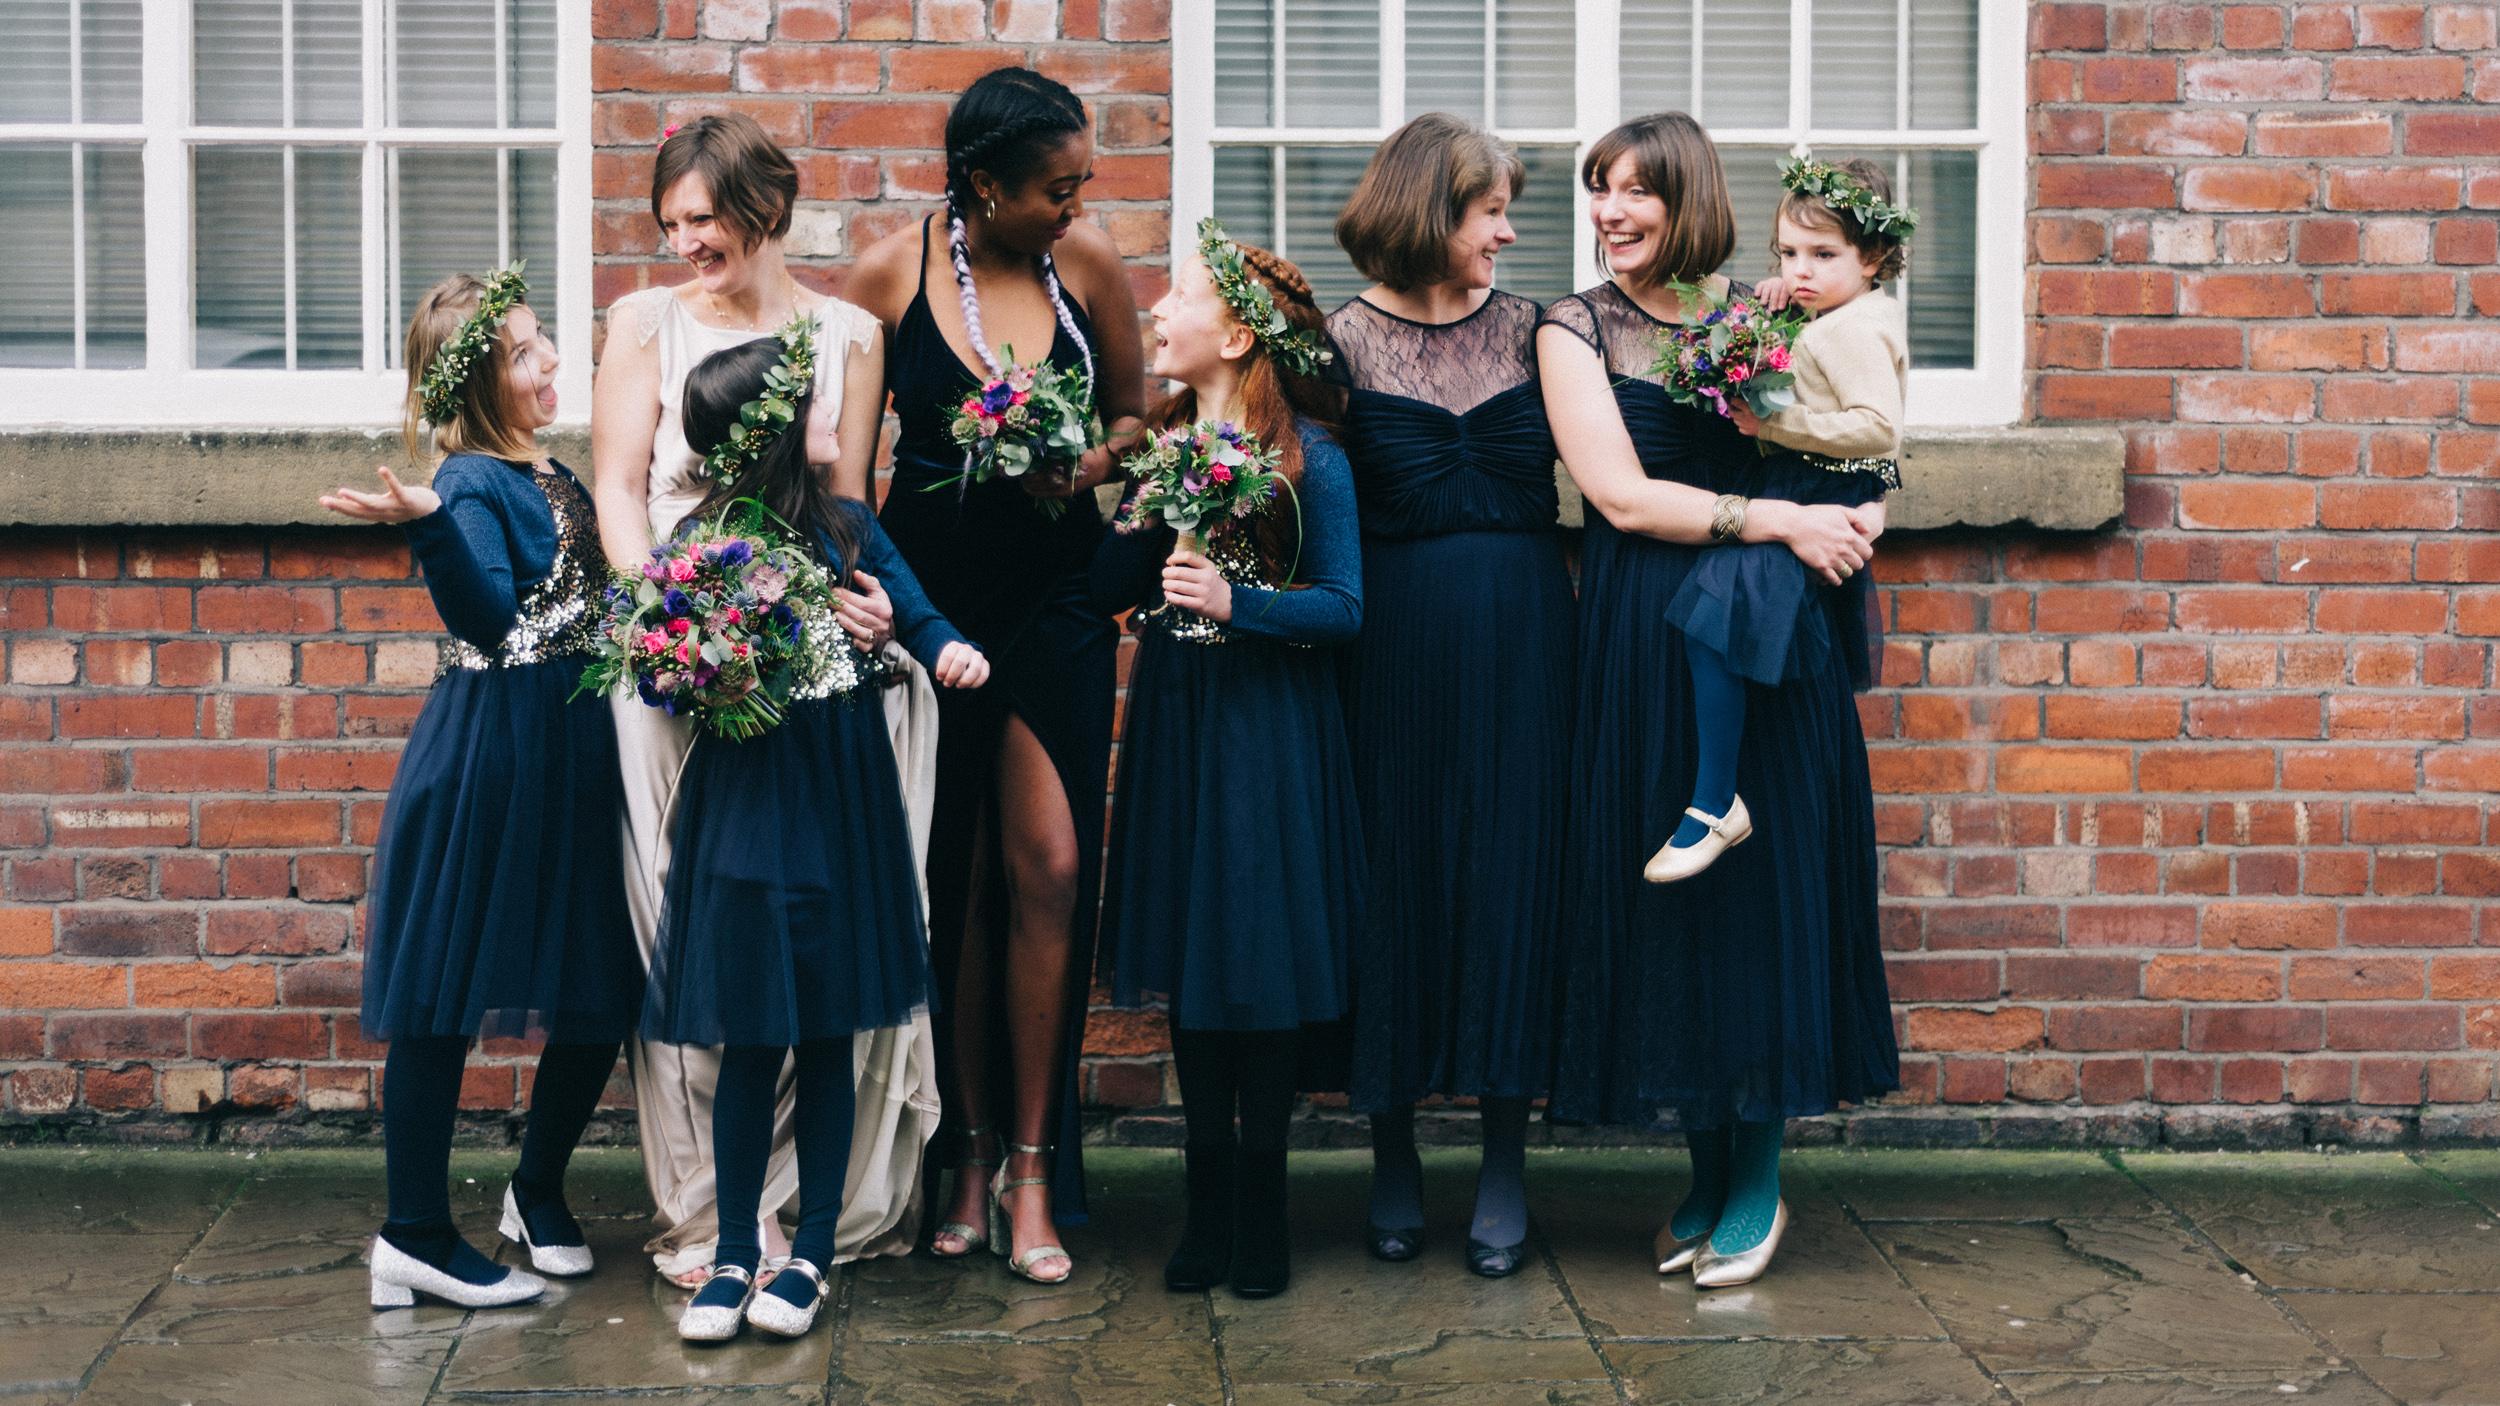 Alice-Bias-Cut-Silk-Wedding-Dress-Kate-Beaumont-Sheffield-Botanical-Gardens-by-Peakography-23.jpg